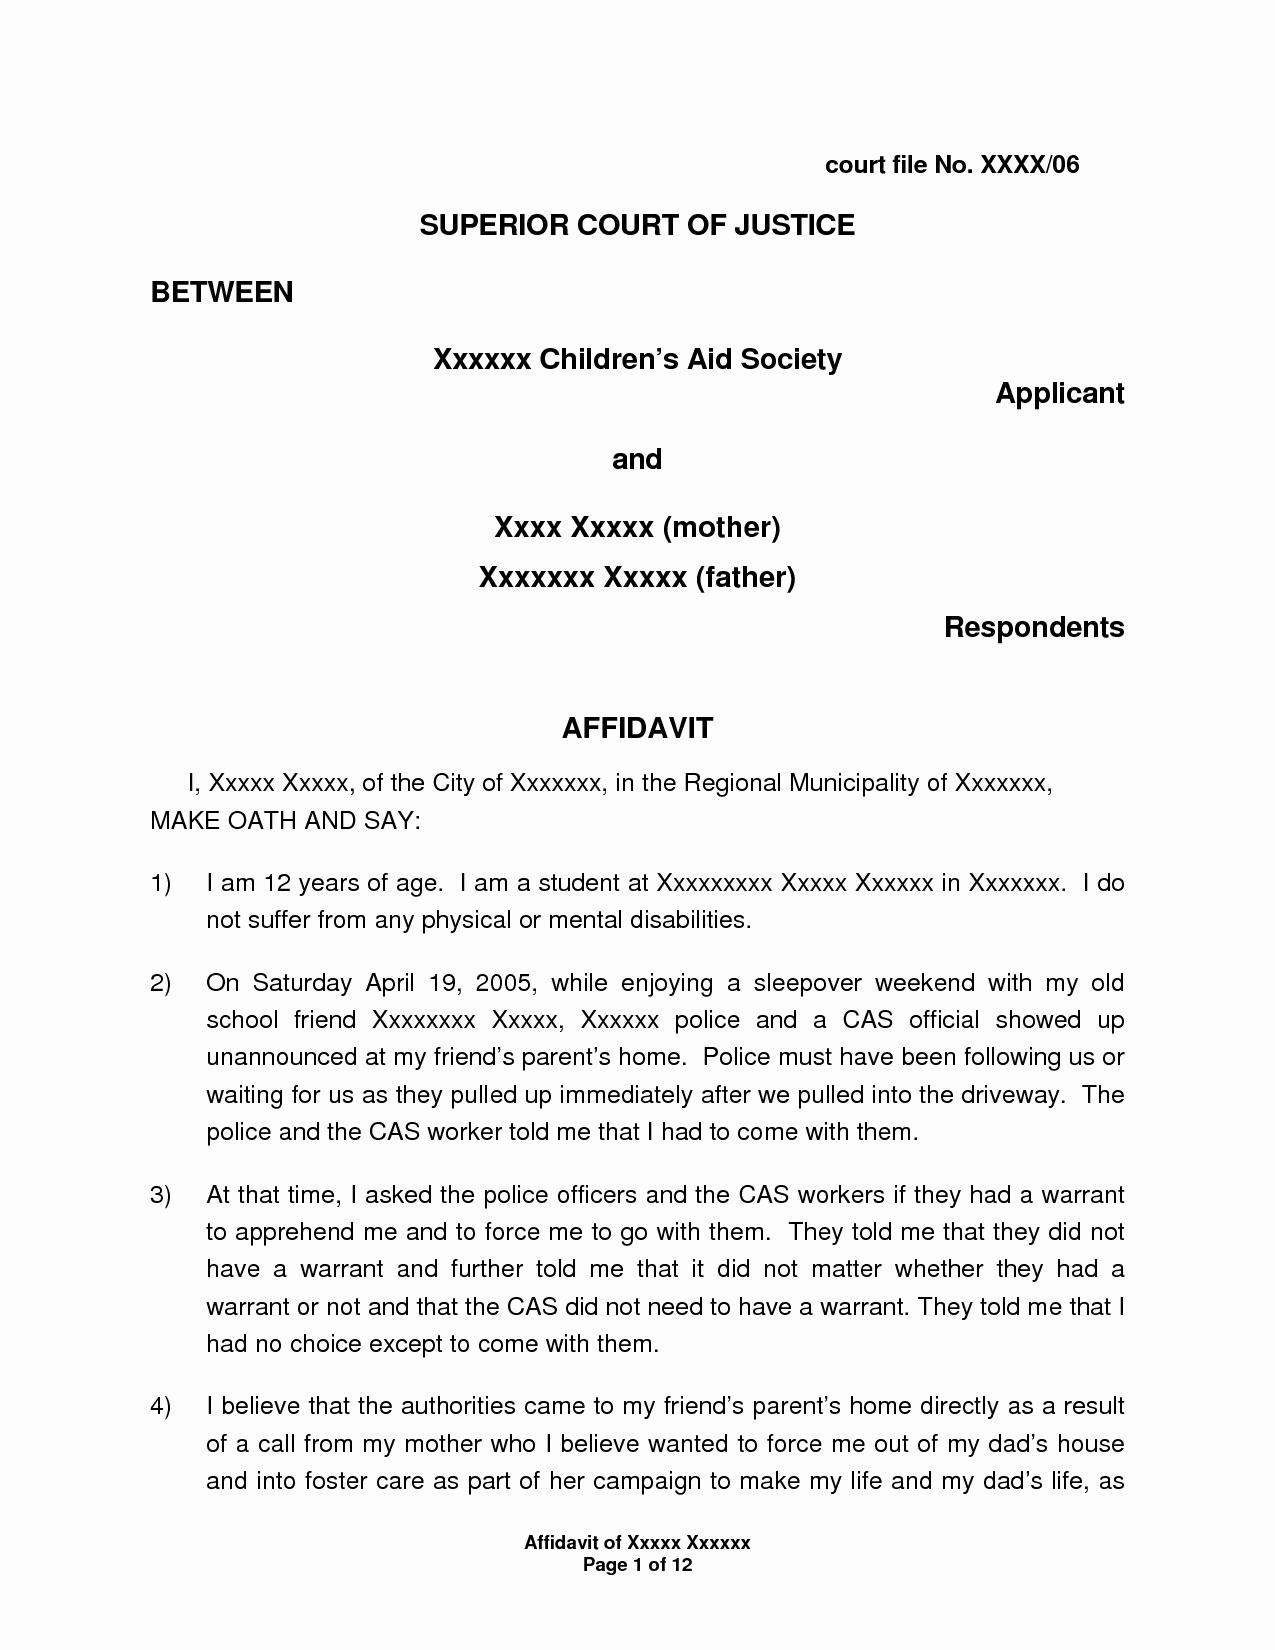 Affidavit Support Letter New Letter Affidavit Sample for Immigration Support